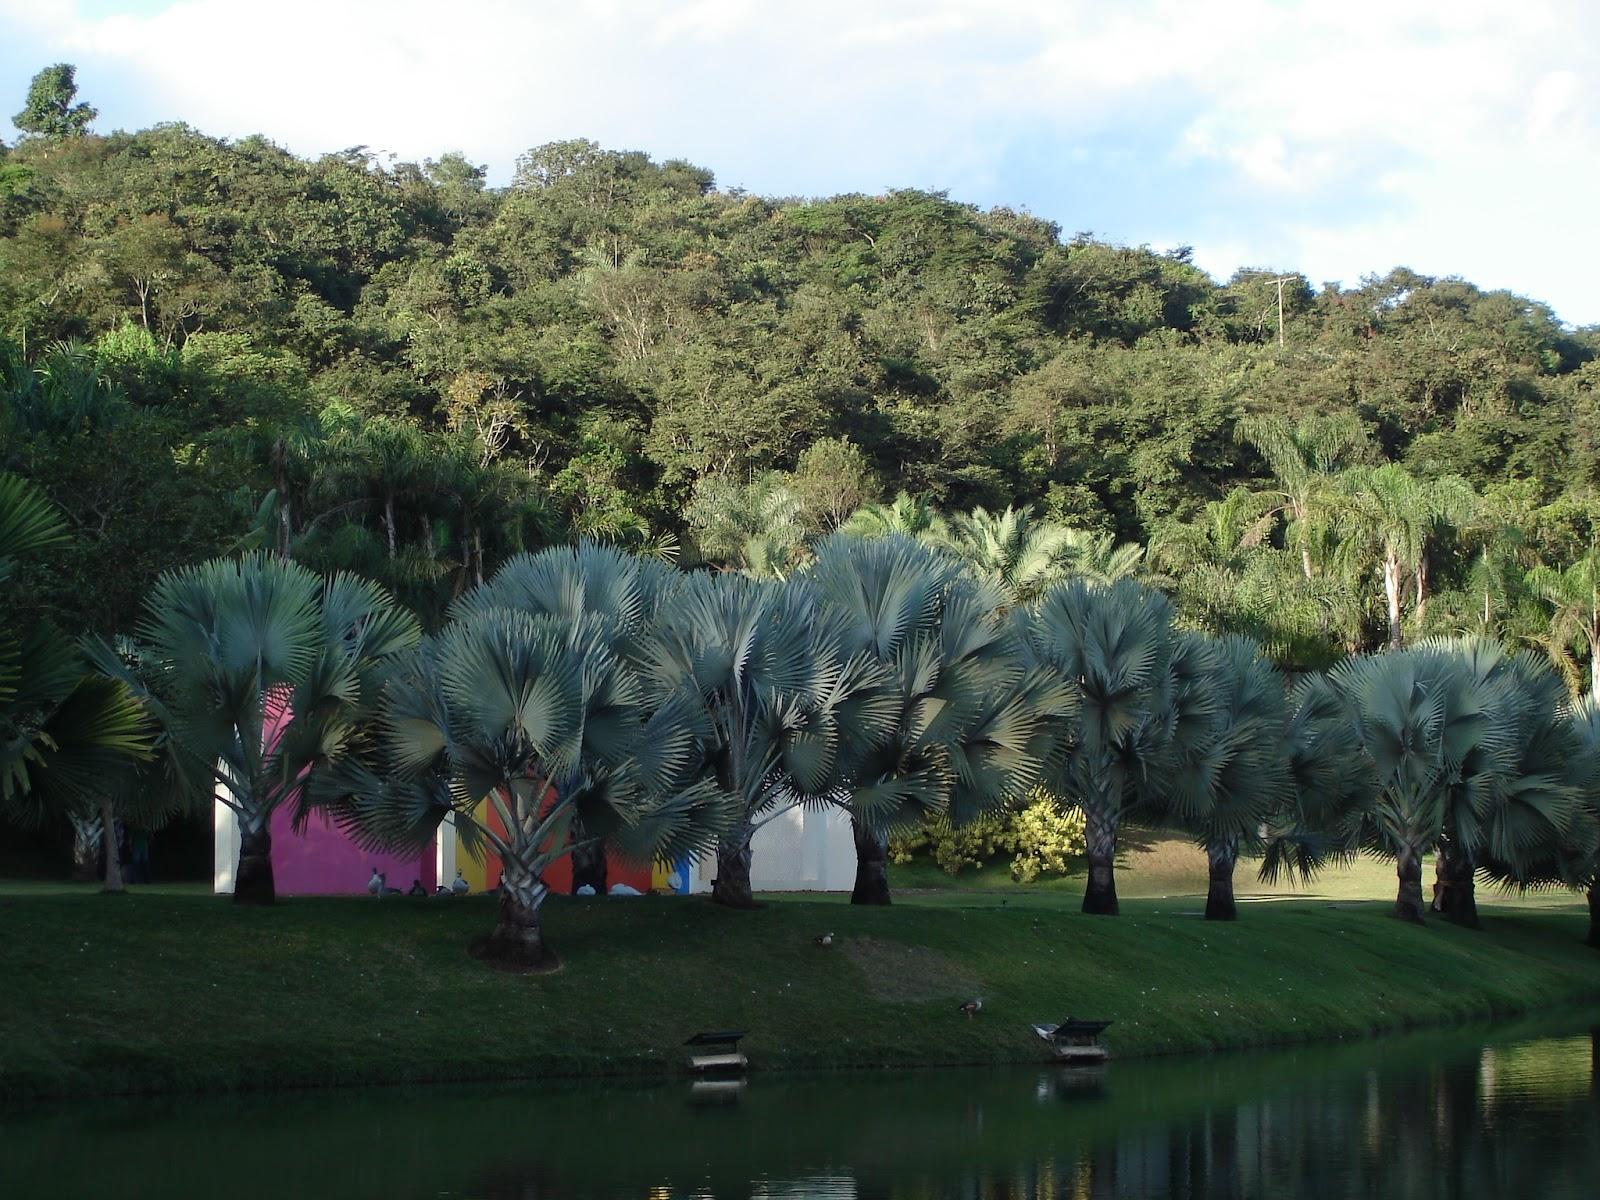 Famosos Brazil Business Tourism: INHOTIM, THE GOLDEN MINE OF ART, BUILT BY  GO89